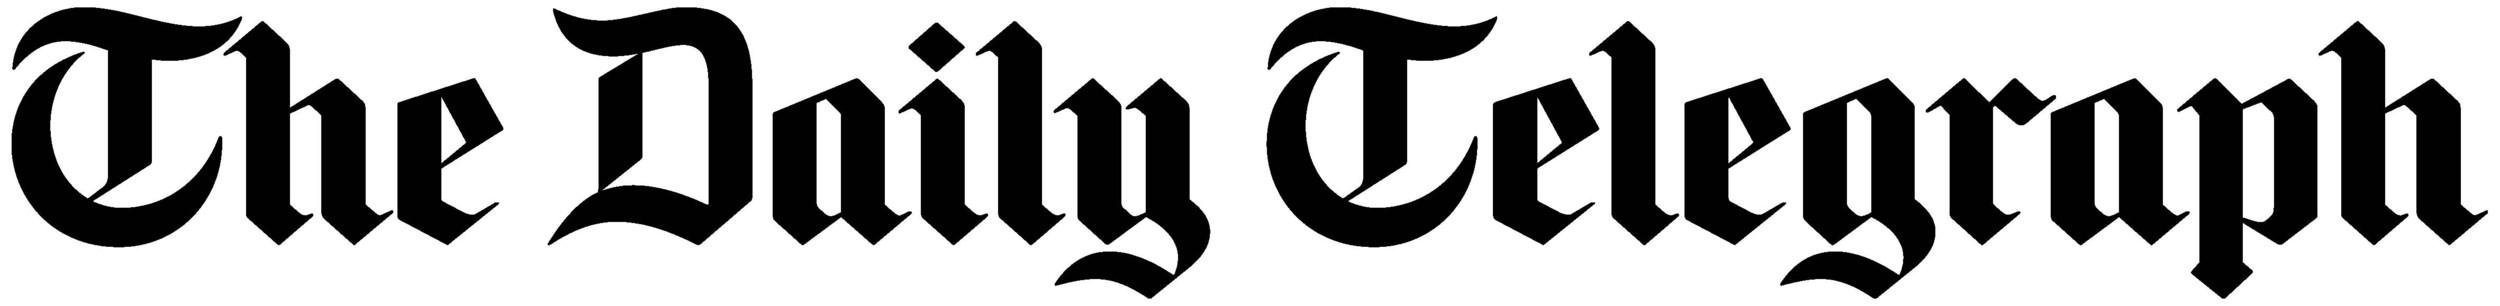 The-Daily-Telegraph-Logo.jpg